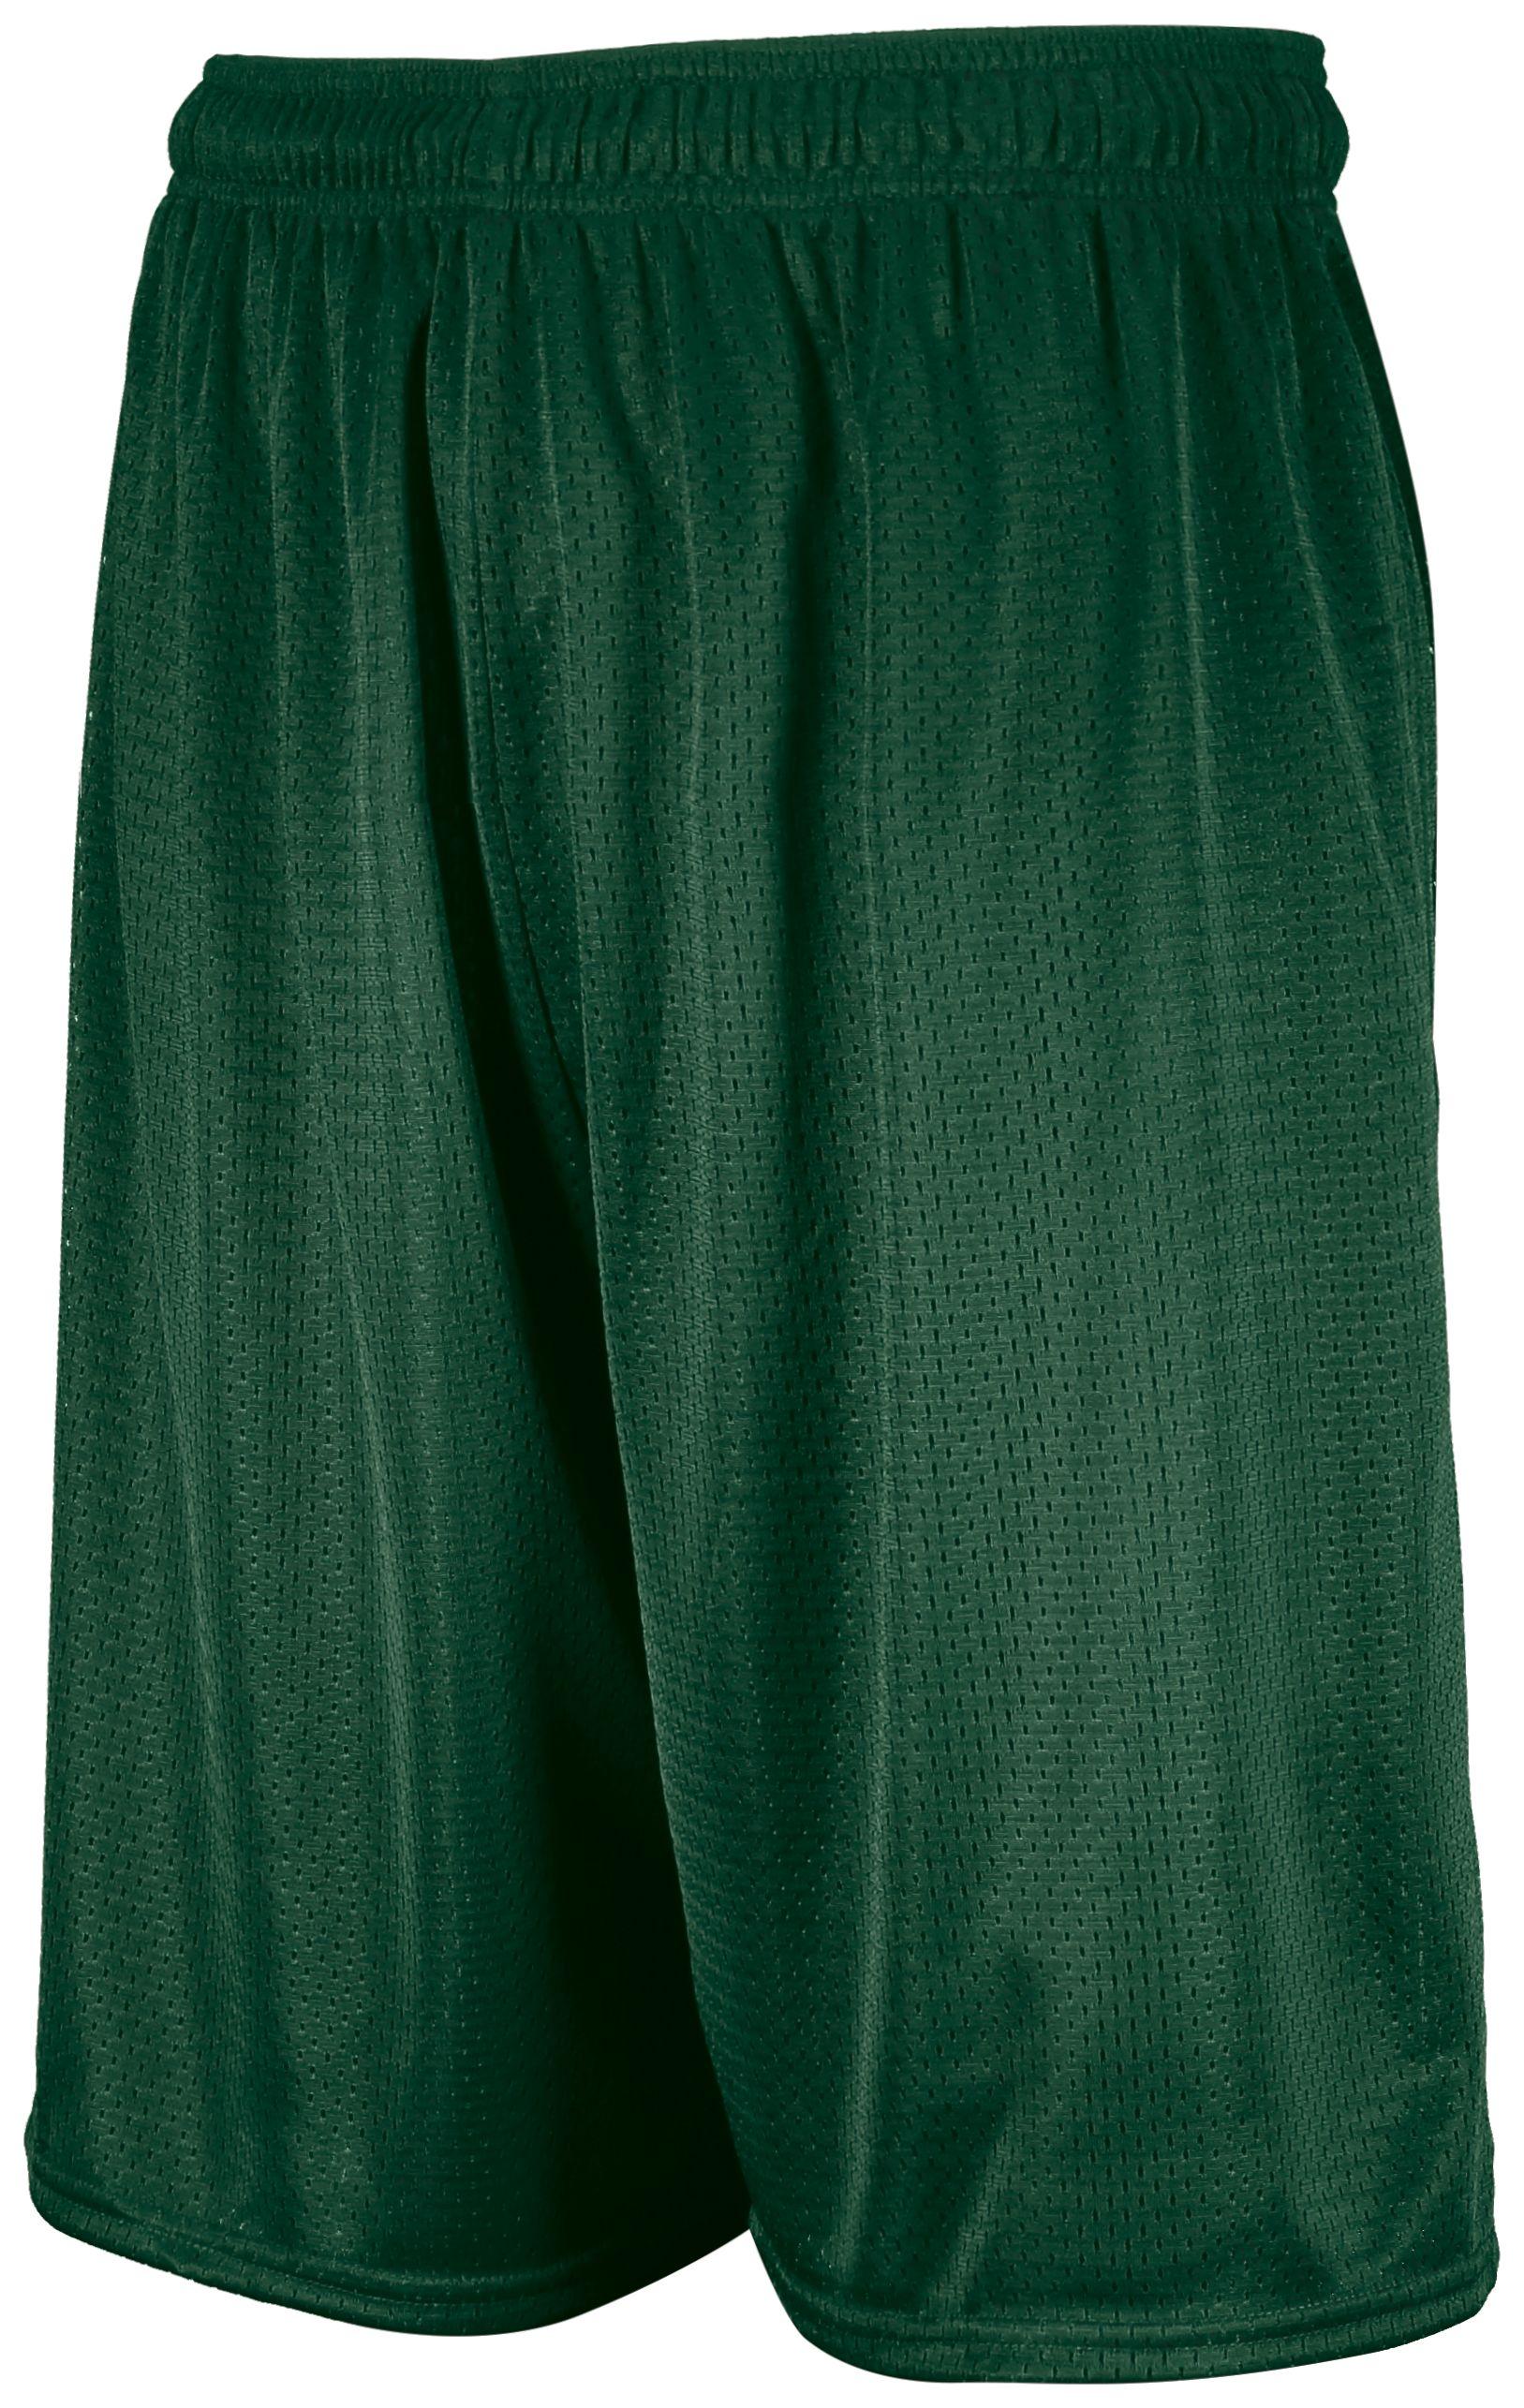 Dri-Power Mesh Shorts - Dark Green